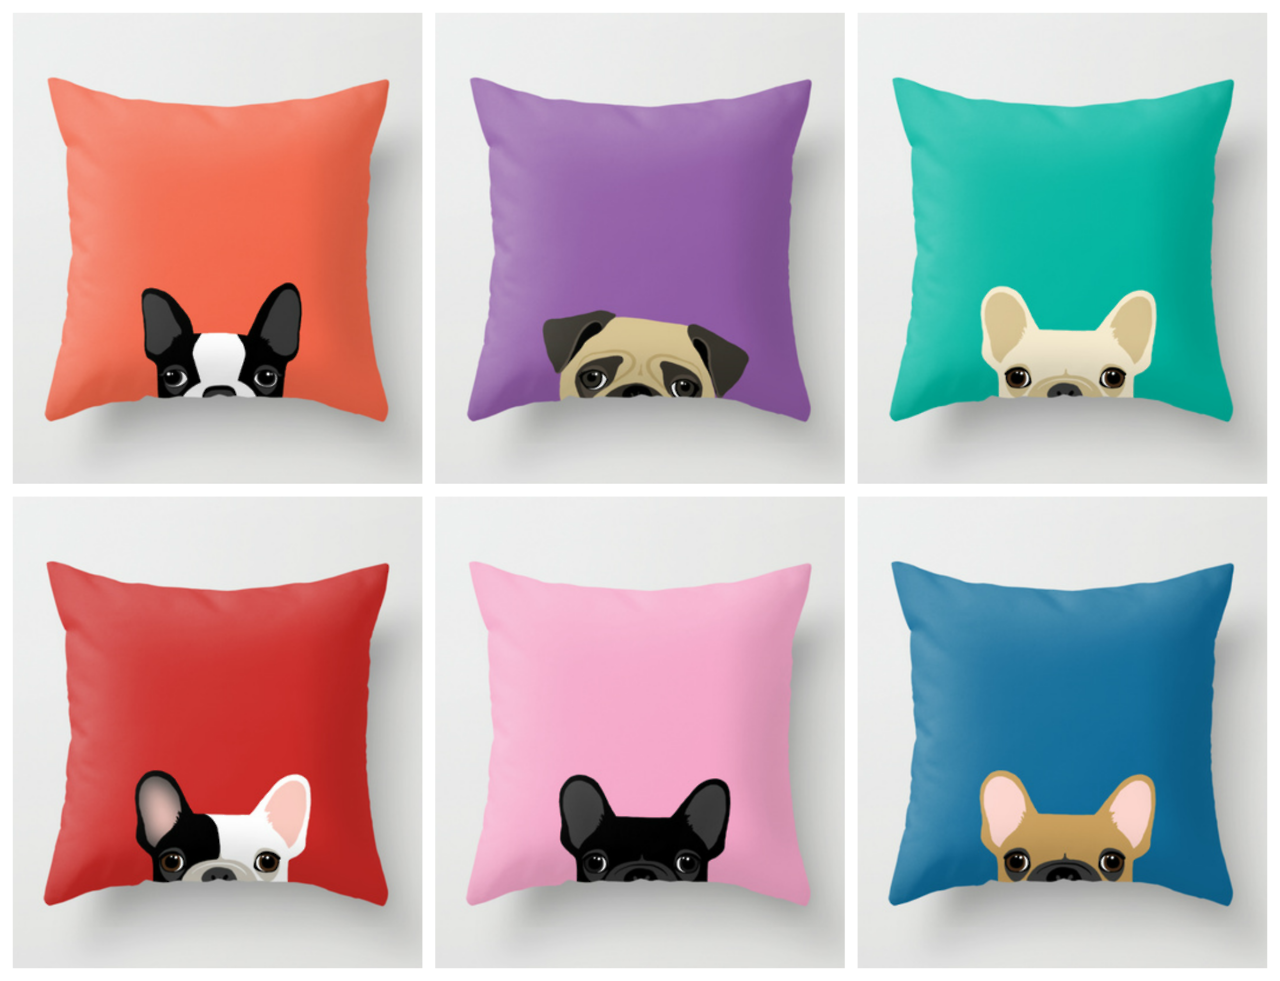 My Sims 3 Blog 6 Cute Dog Pillows By Simmersarah Sims 3